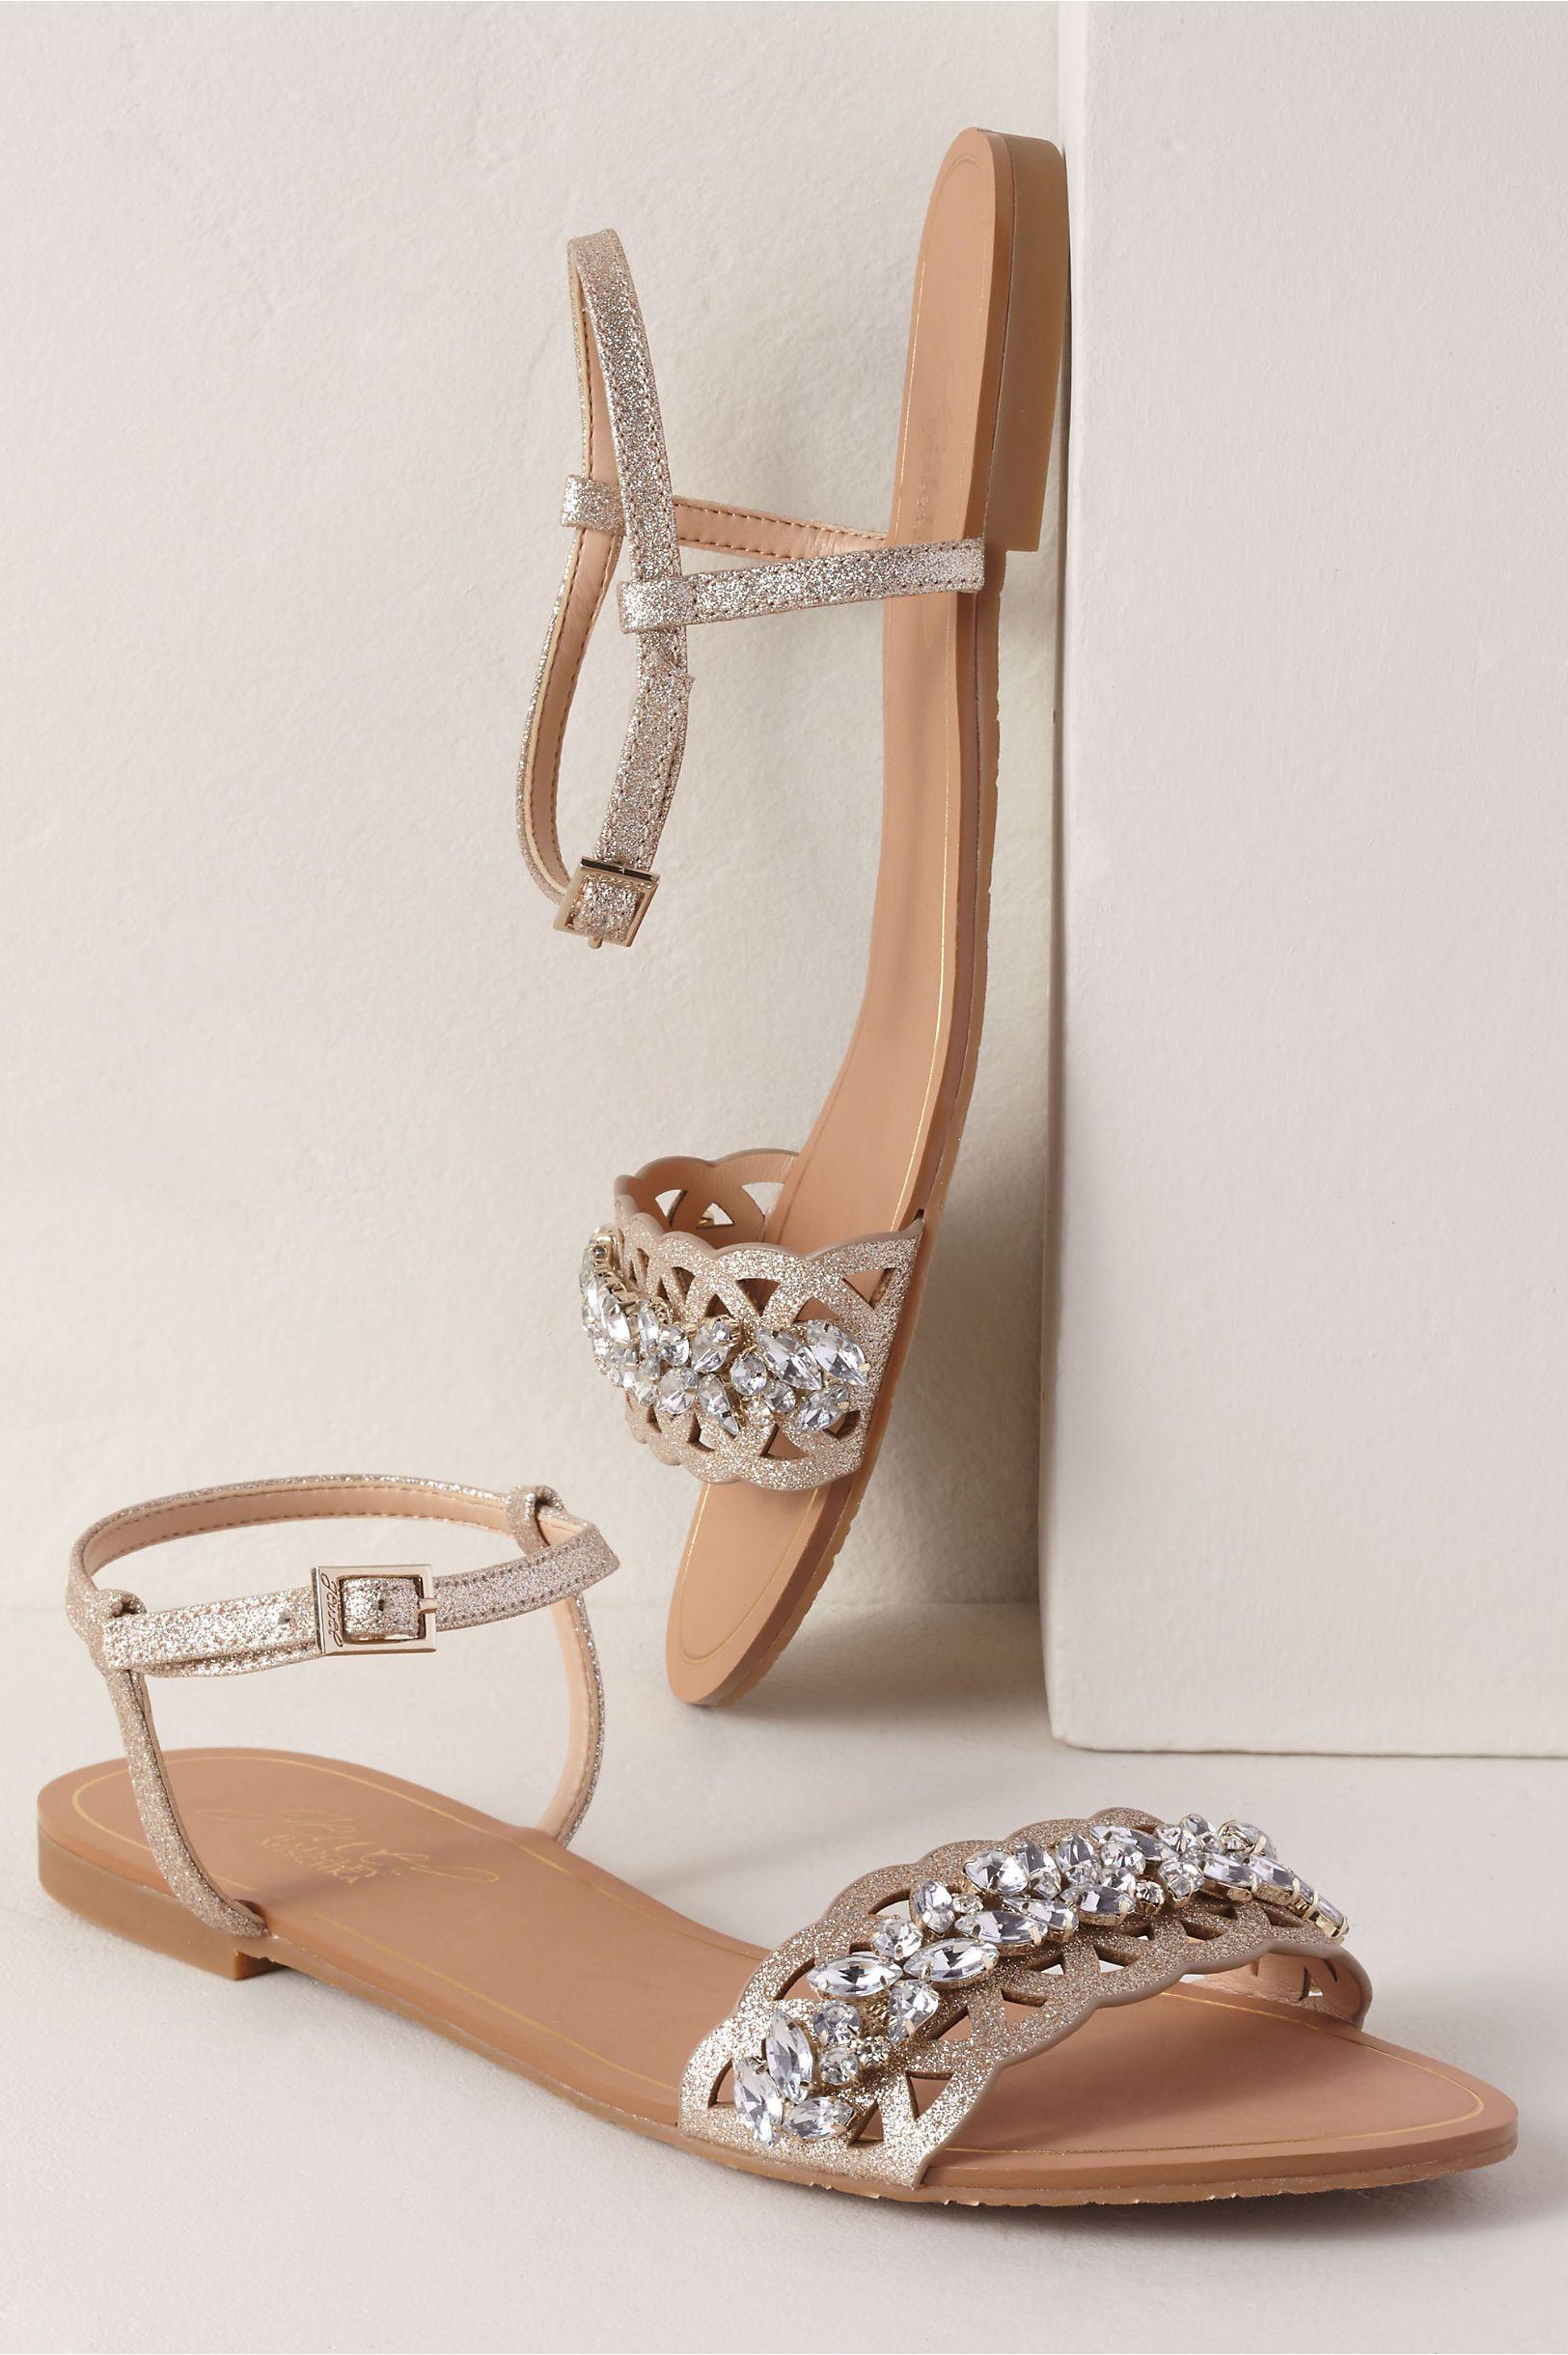 Jewel by Badgley Mischka Kimora Sandals   Sparkly wedding